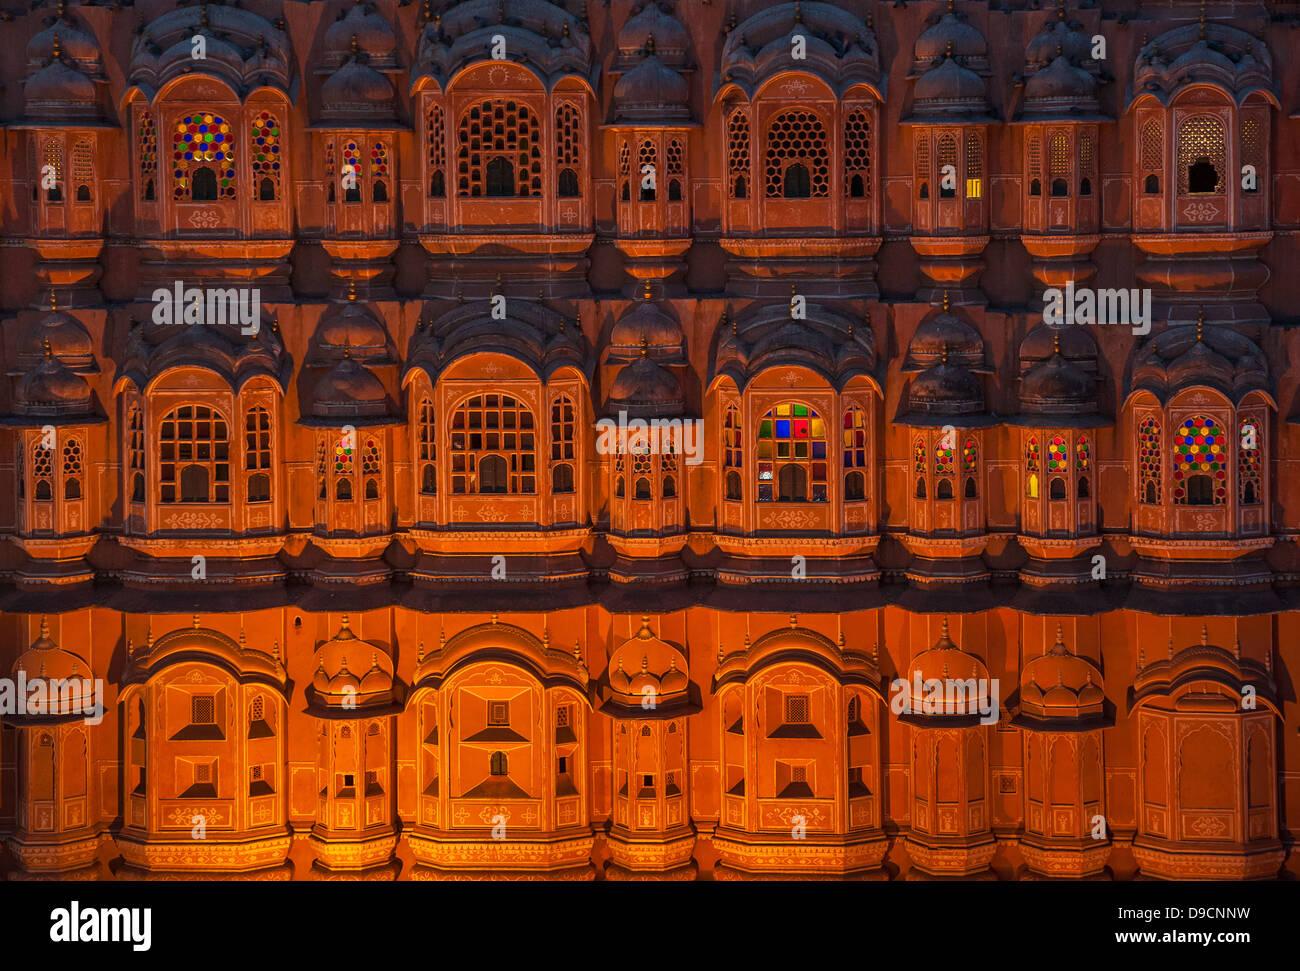 Hawa Mahal, Palace of winds, Jaipur, India - Stock Image